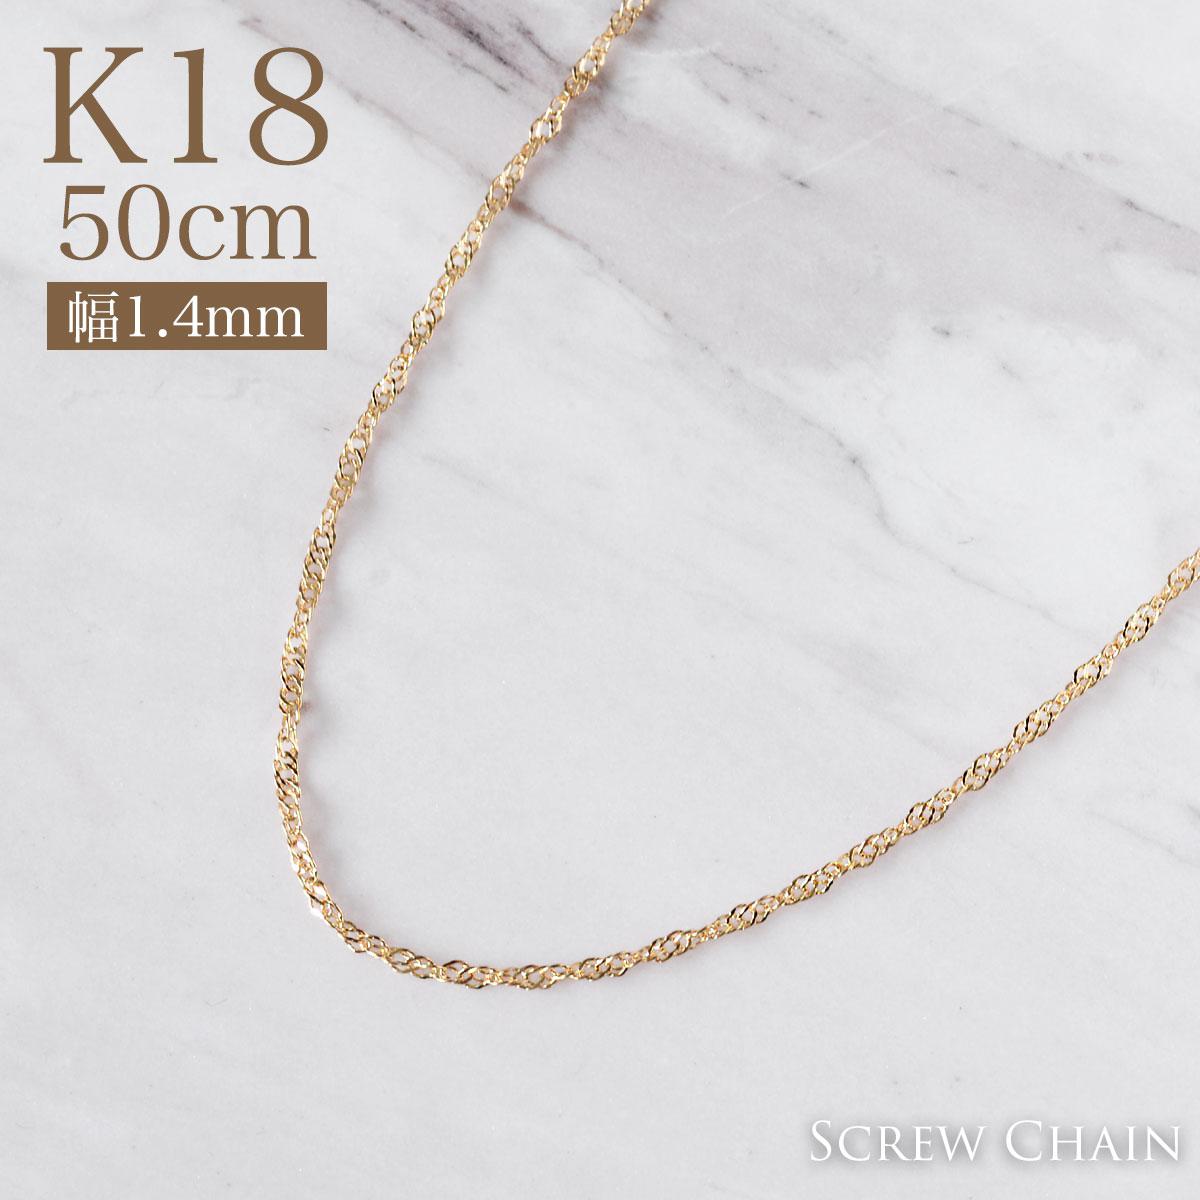 K18 イエローゴールド スクリュー 幅1.4mm チェーン 50cm / プレゼント ギフト gold necklace ach1612ae